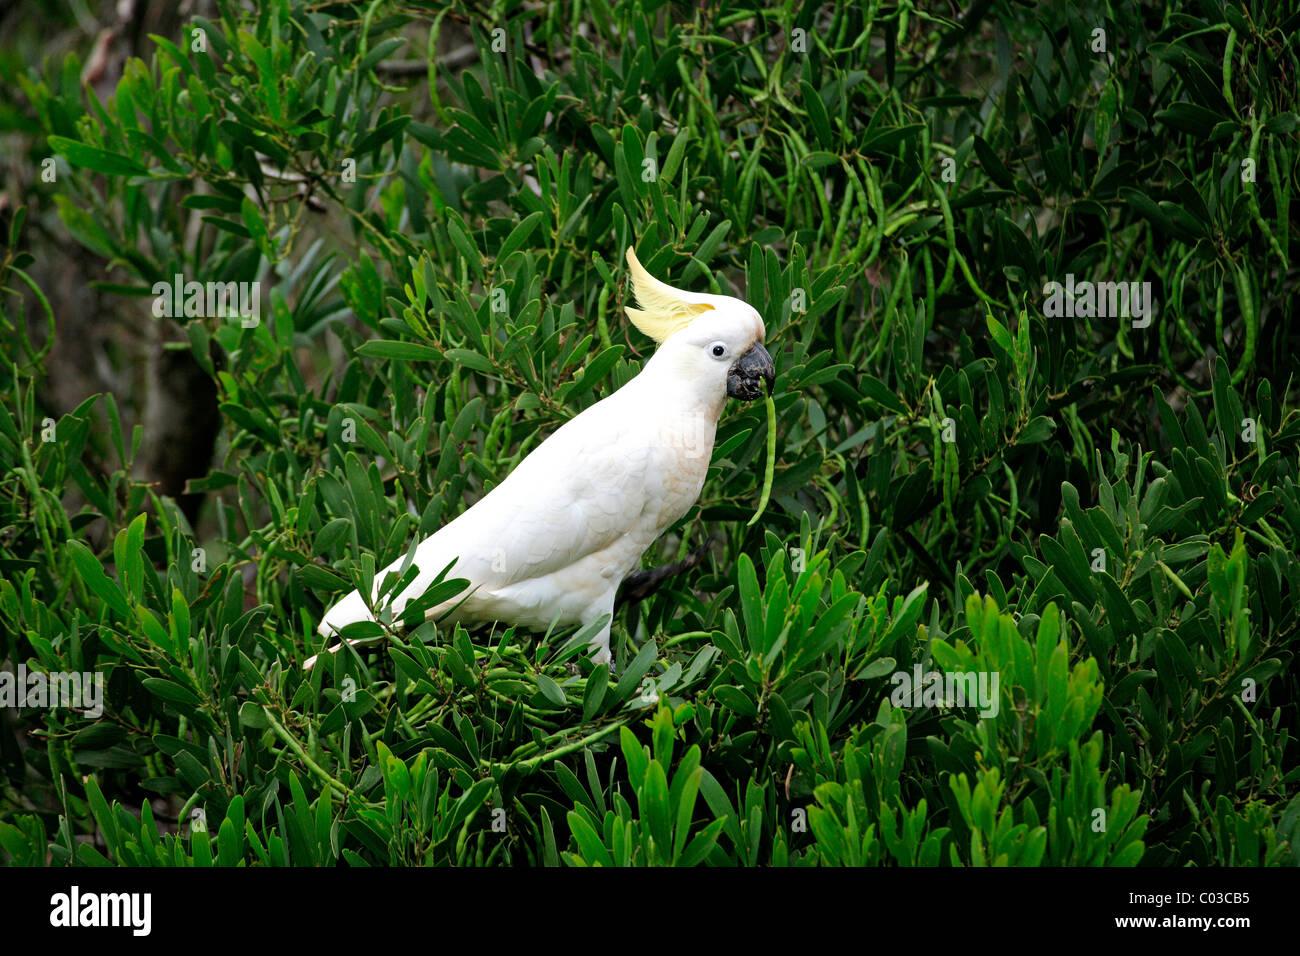 Sulphur-crested Cockatoo (Cacatua galerita), adult bird in the tree in search of food, Australia - Stock Image